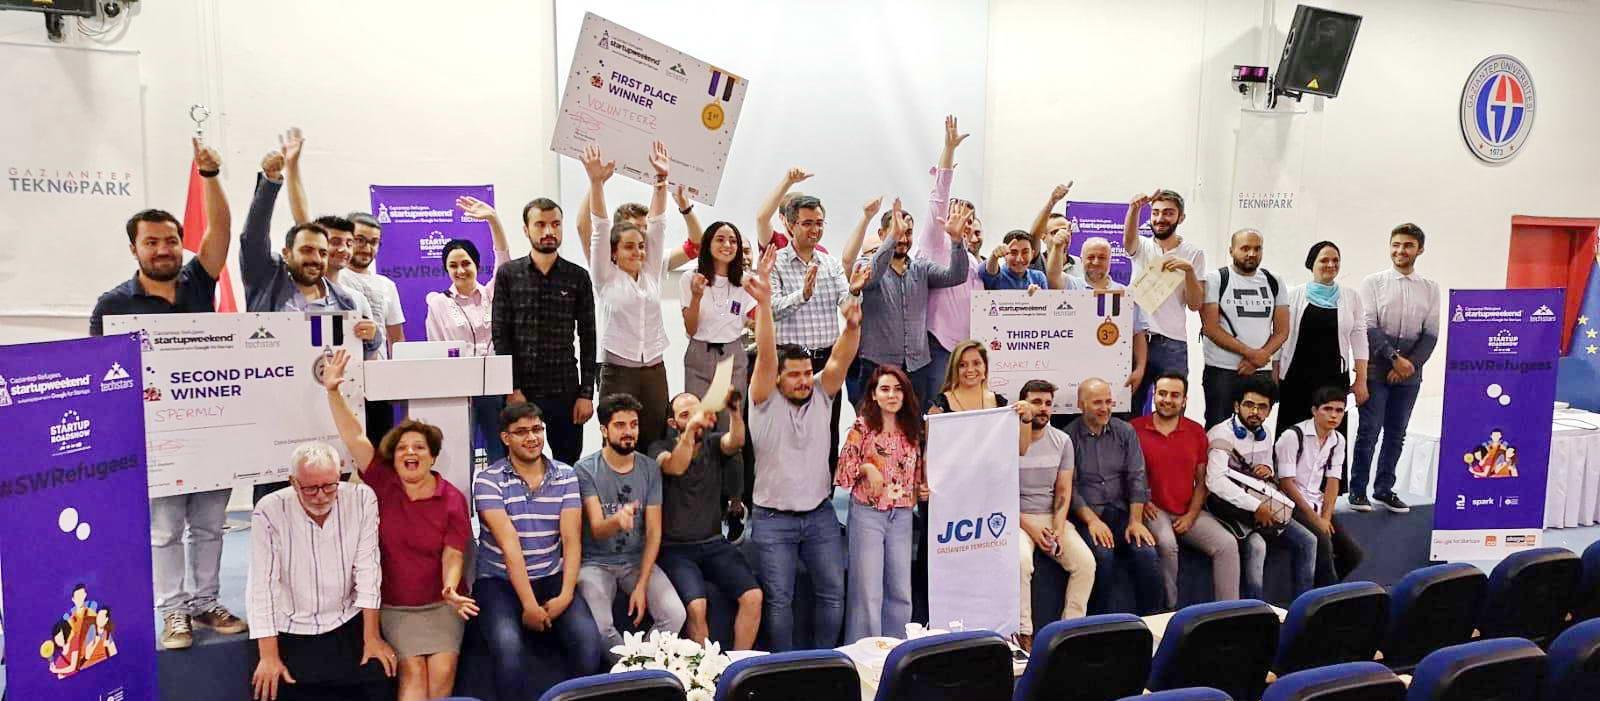 Startup Weekend, Gaziantep TEKNOPARK'ta Gerçekleşti -  (1)